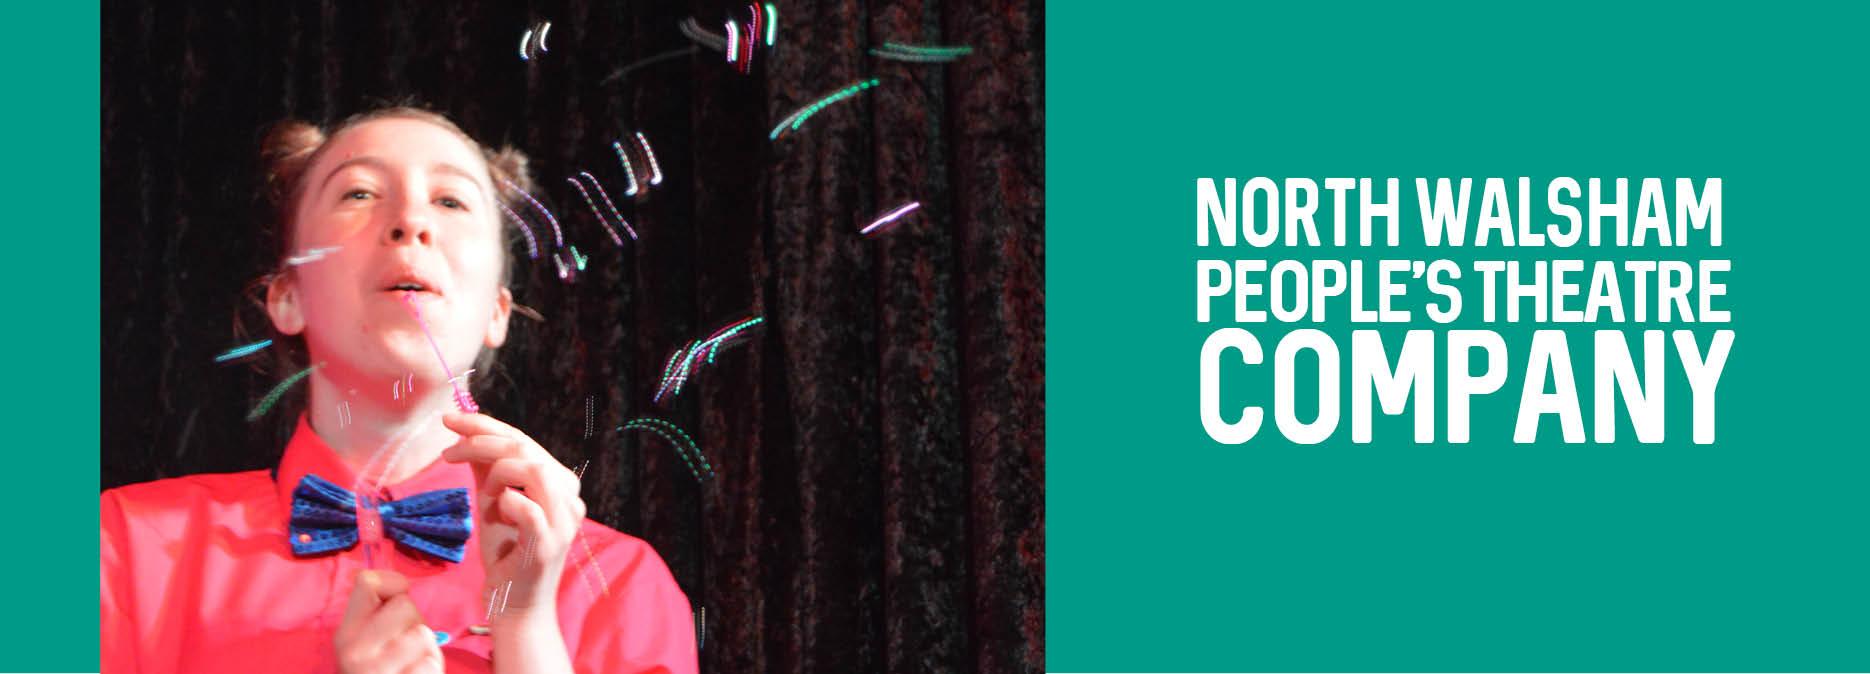 NWPTC banner